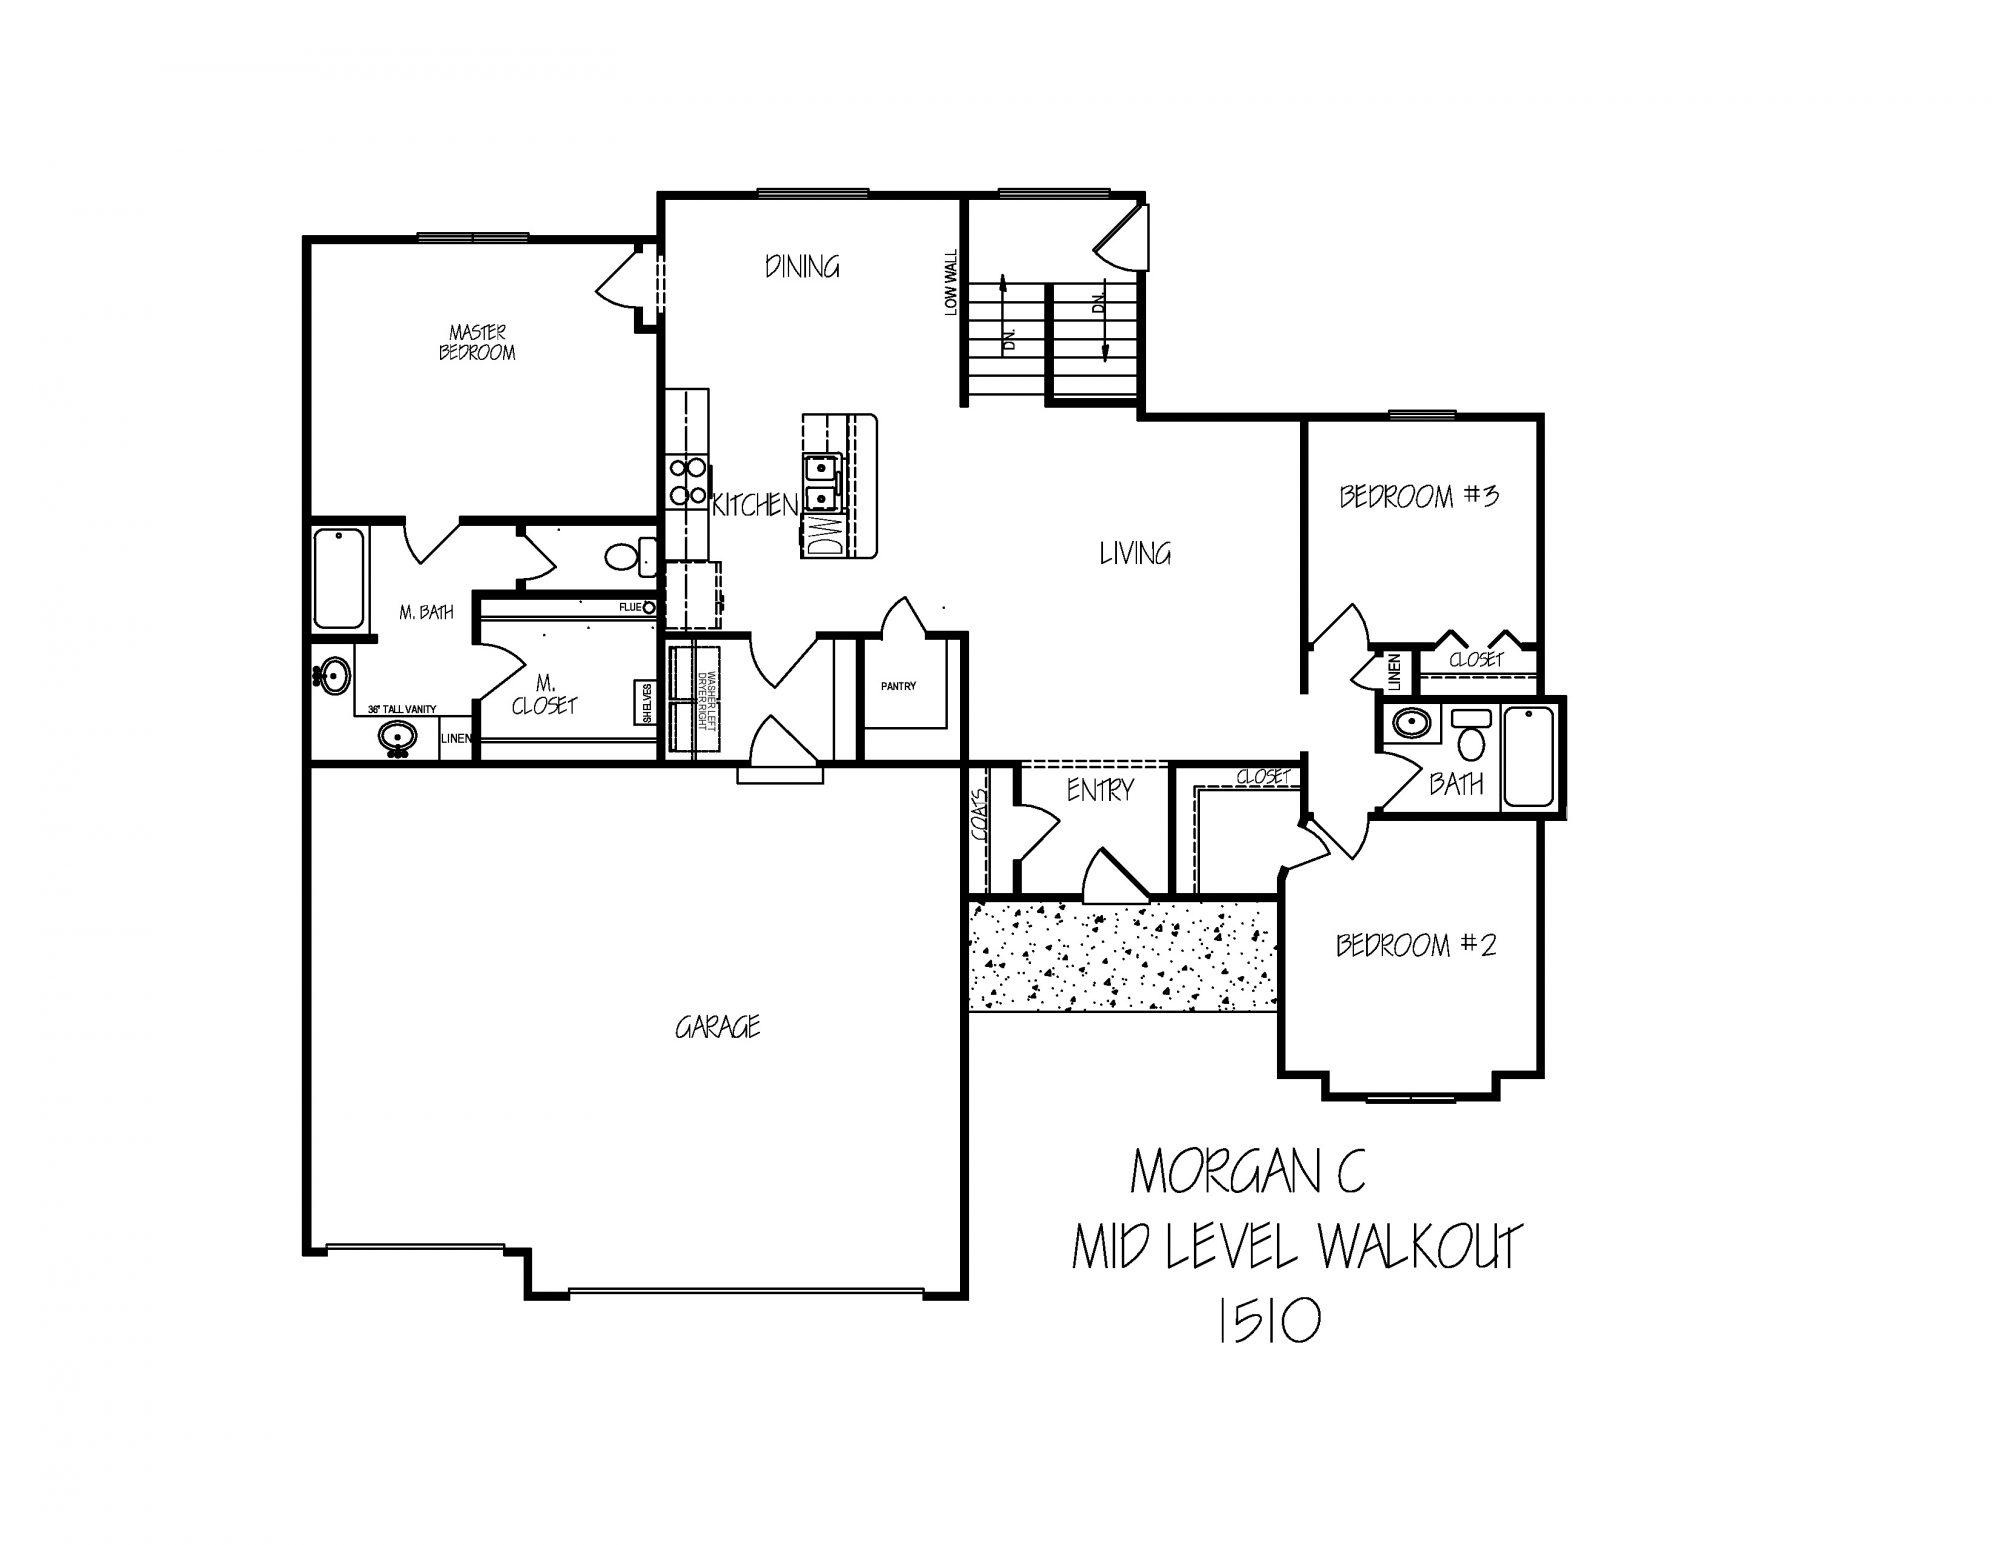 MORGAN C MLWO BL-page-0